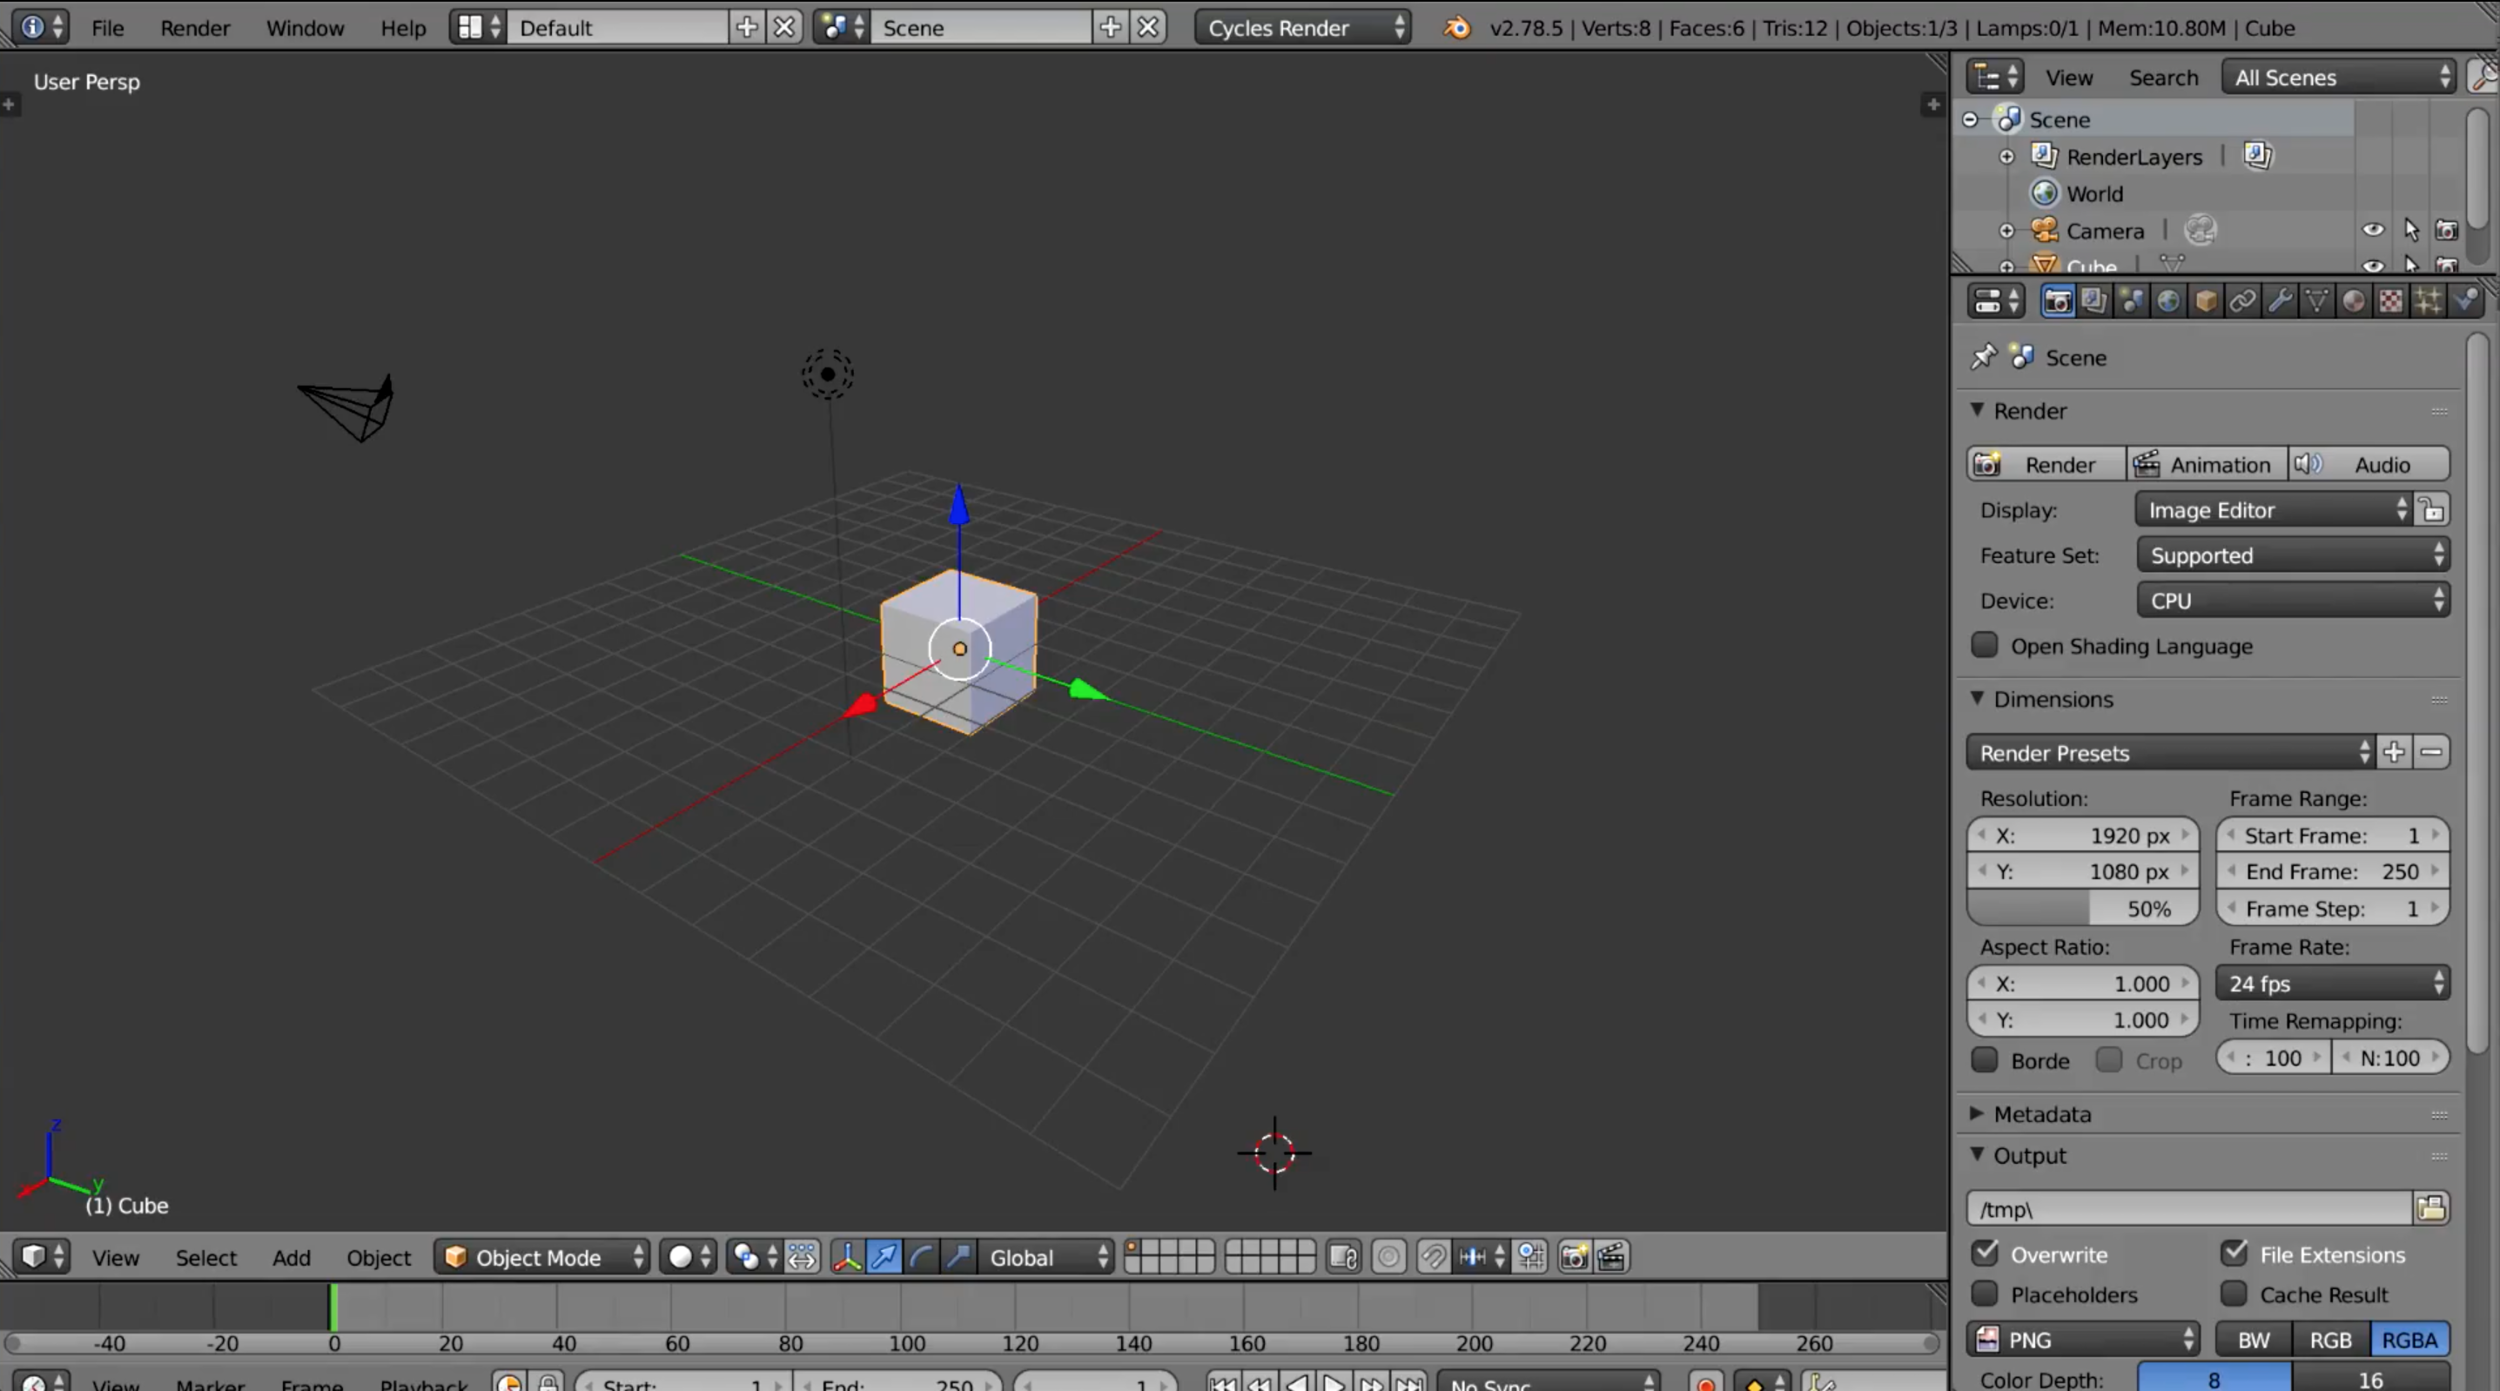 Screenshot of Blender 2.79